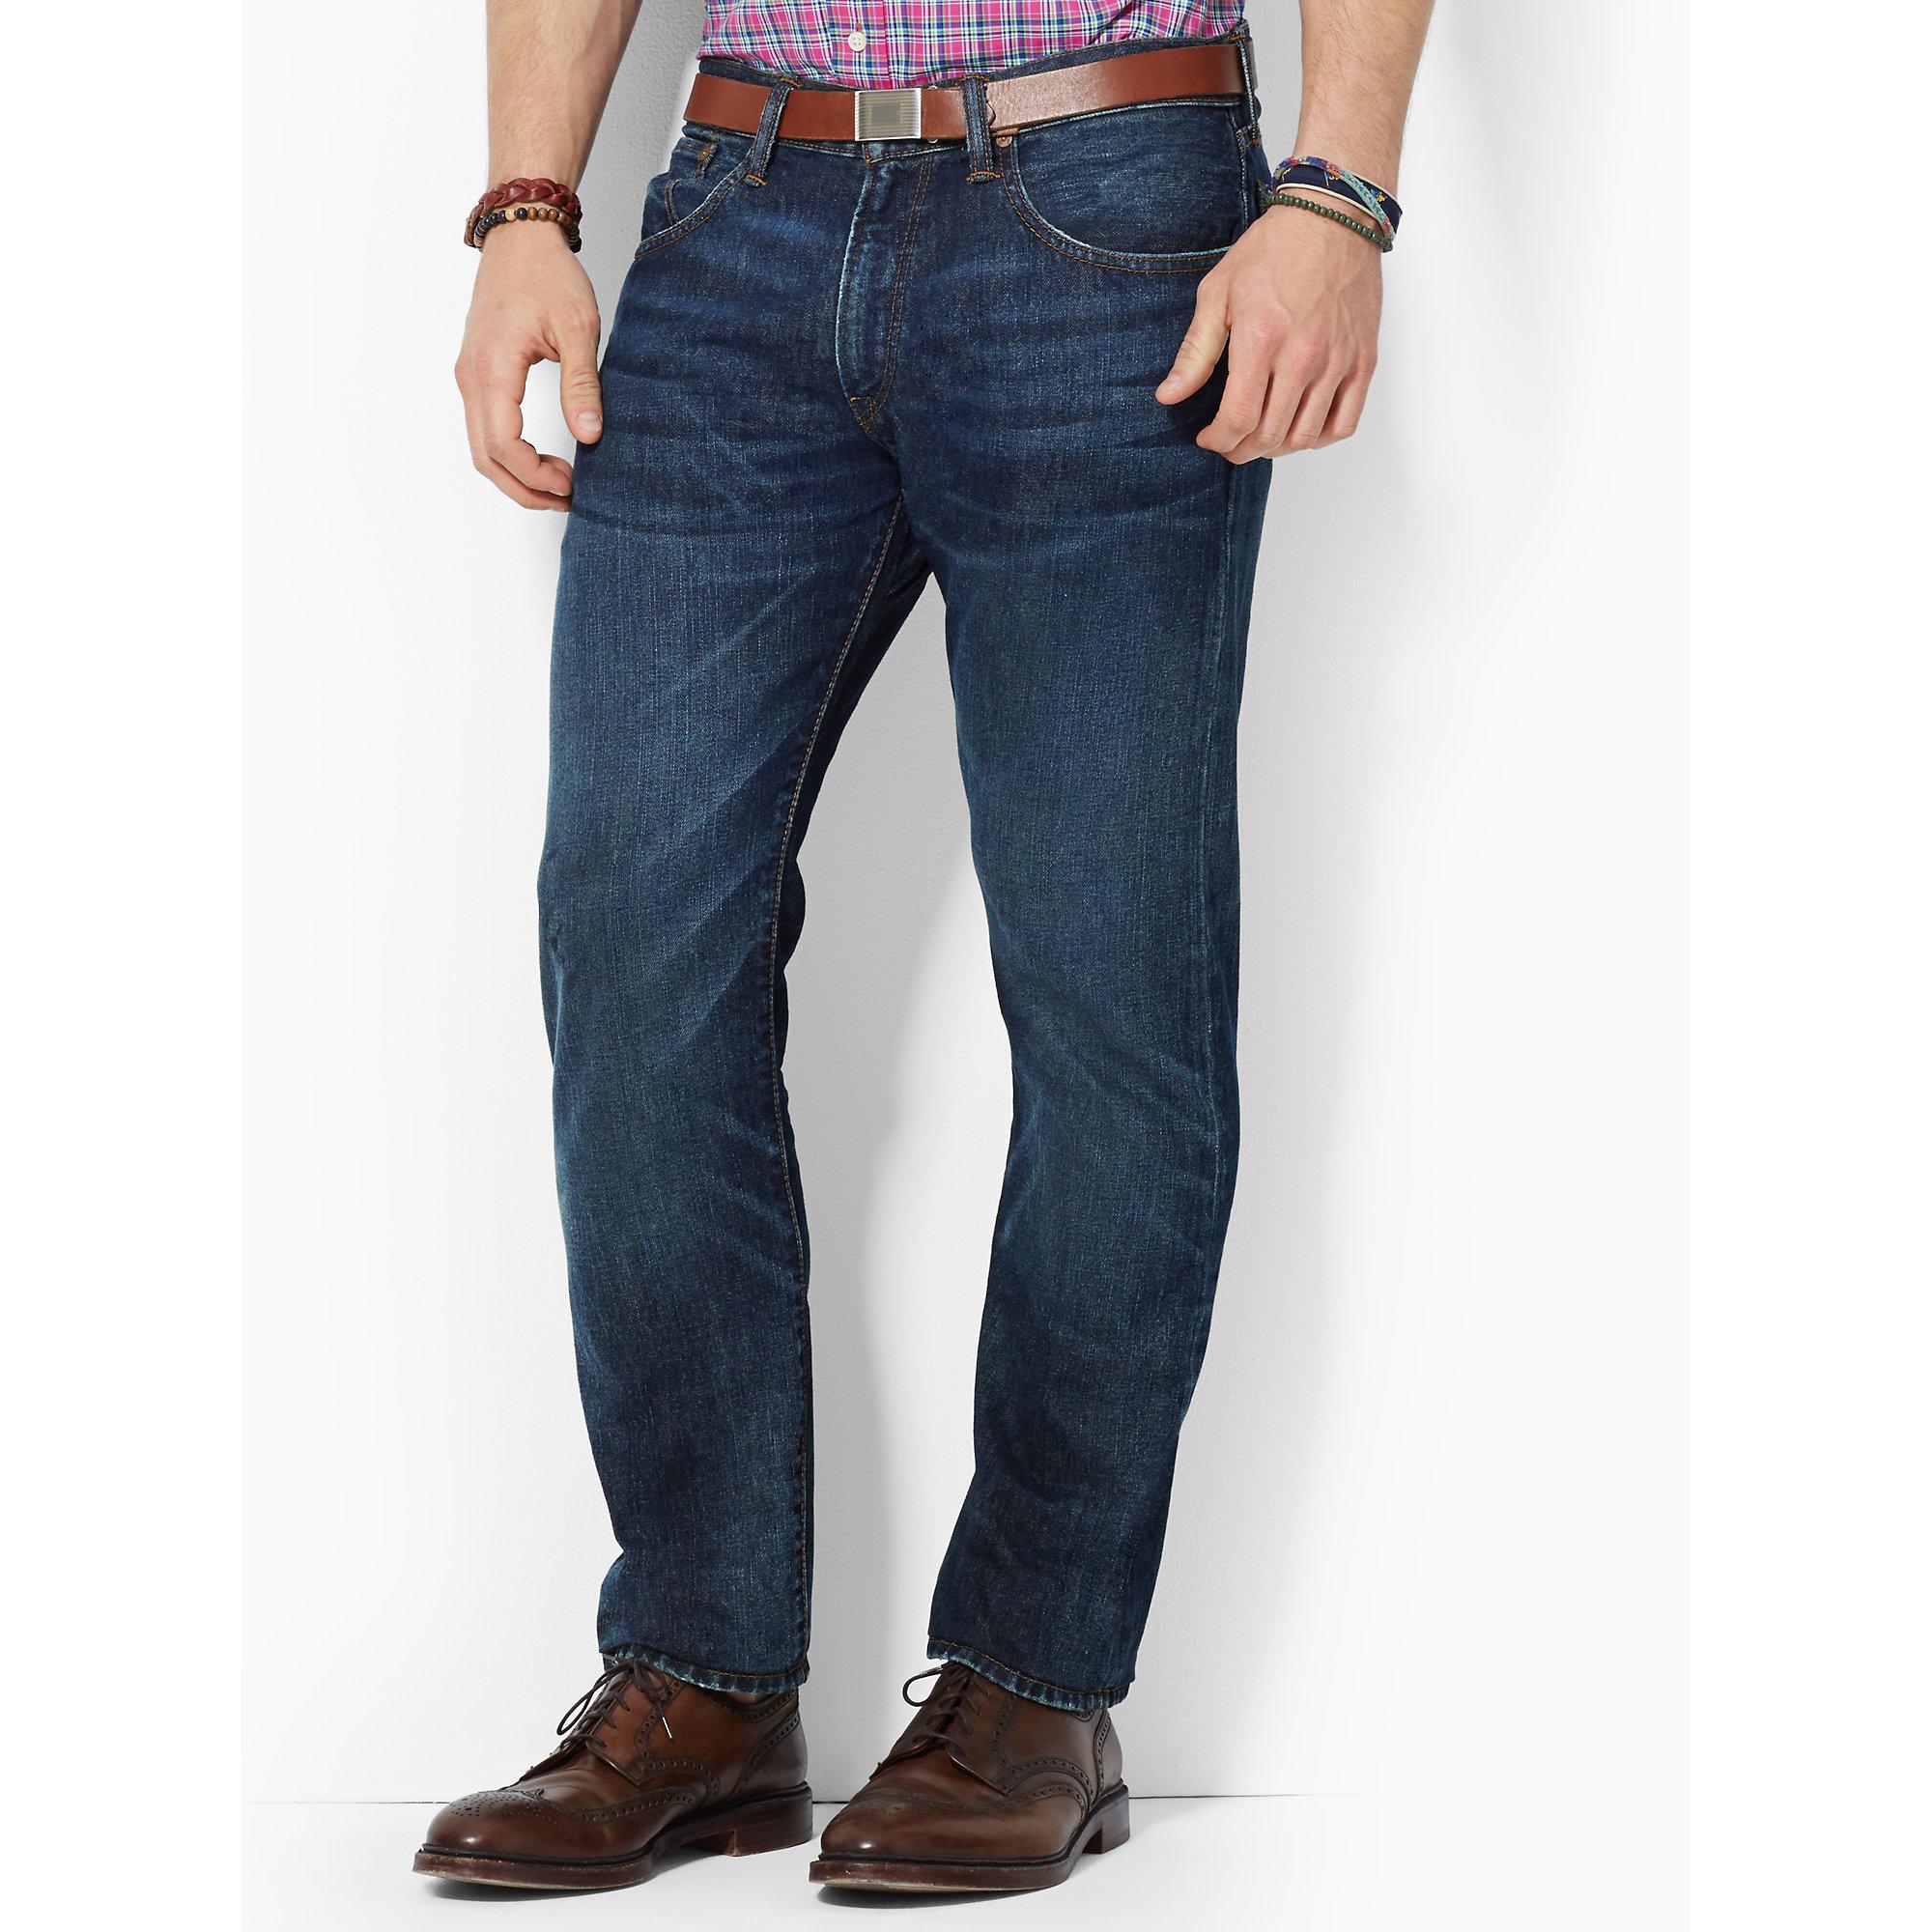 b9869b24 Polo Ralph Lauren Jeans Classic Fit 867 Mens Denim